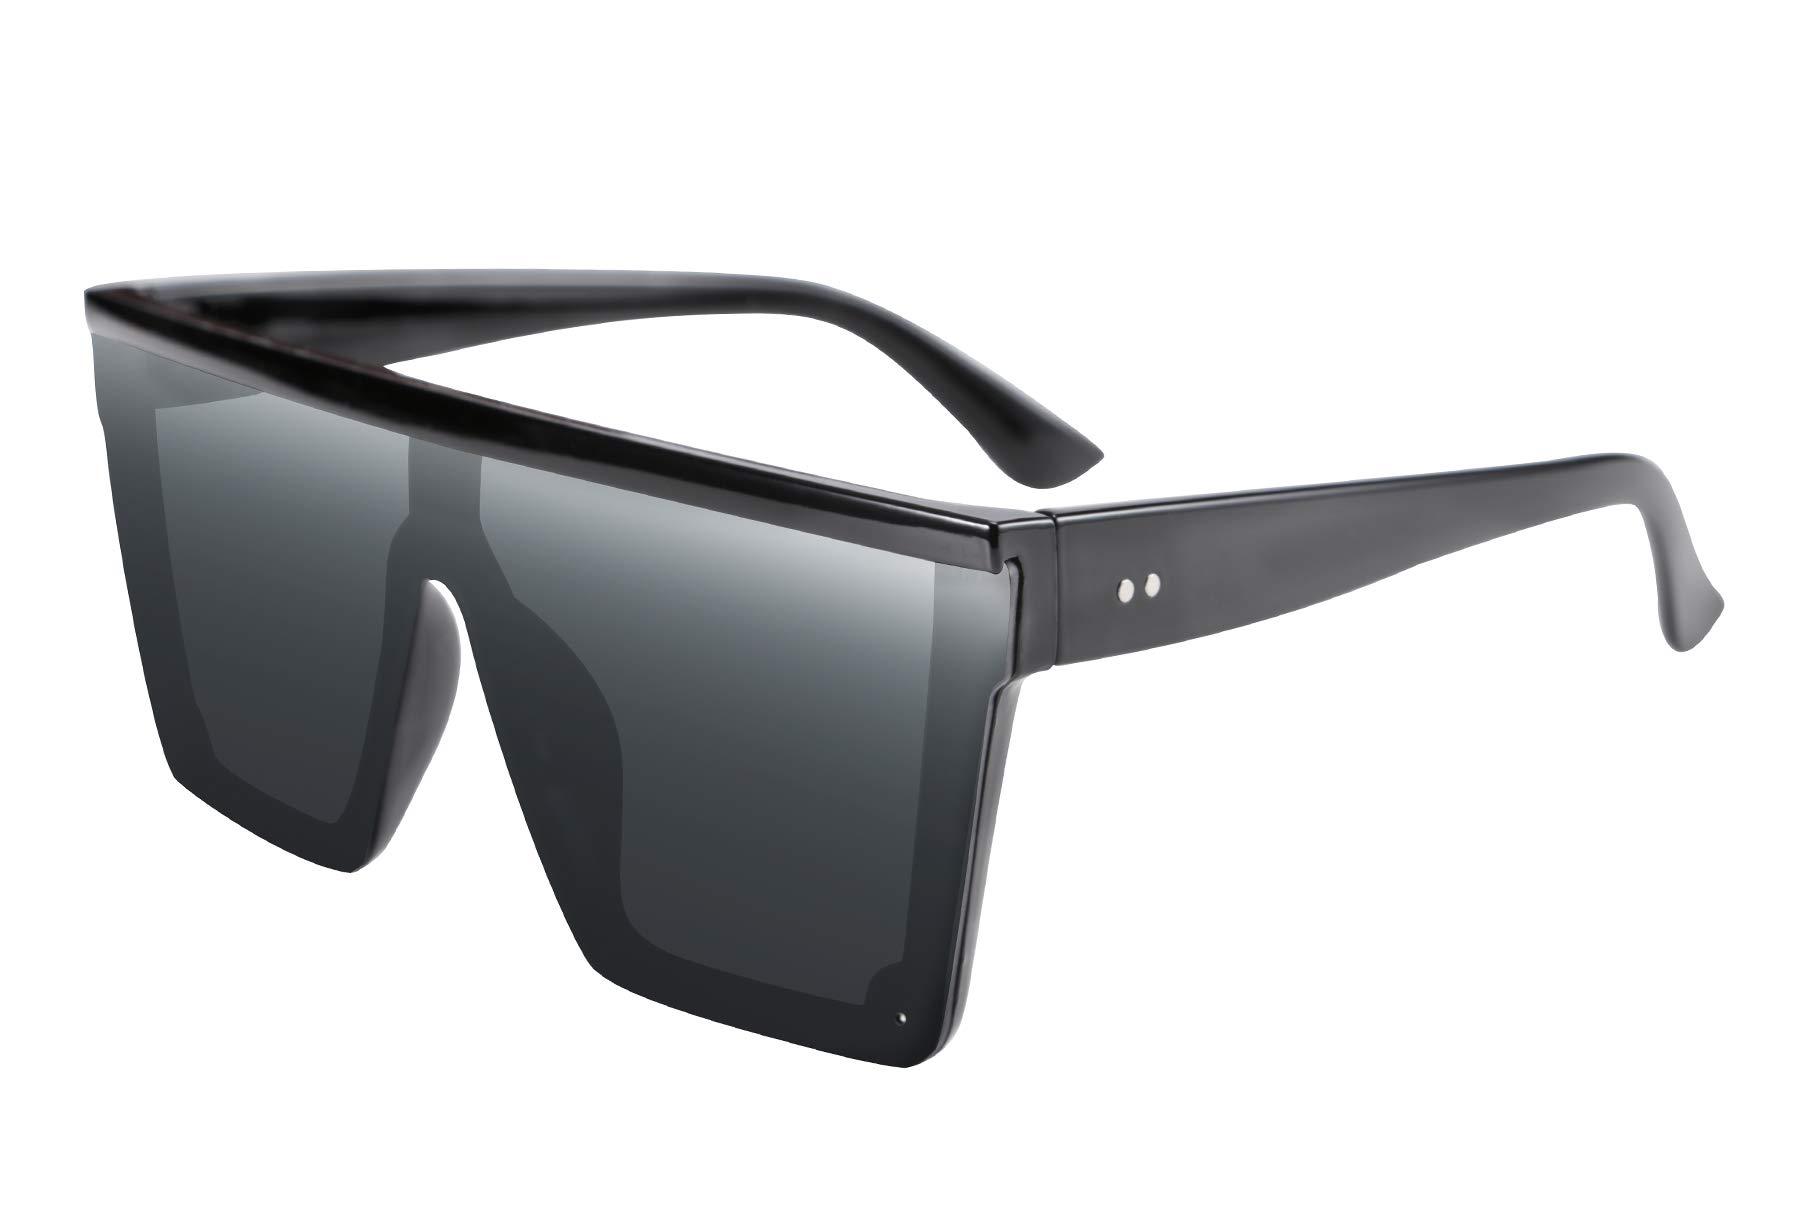 FEISEDY Fashion Oversize Siamese Lens Sunglasses Women Men Succinct Style UV400 B2470 by FEISEDY